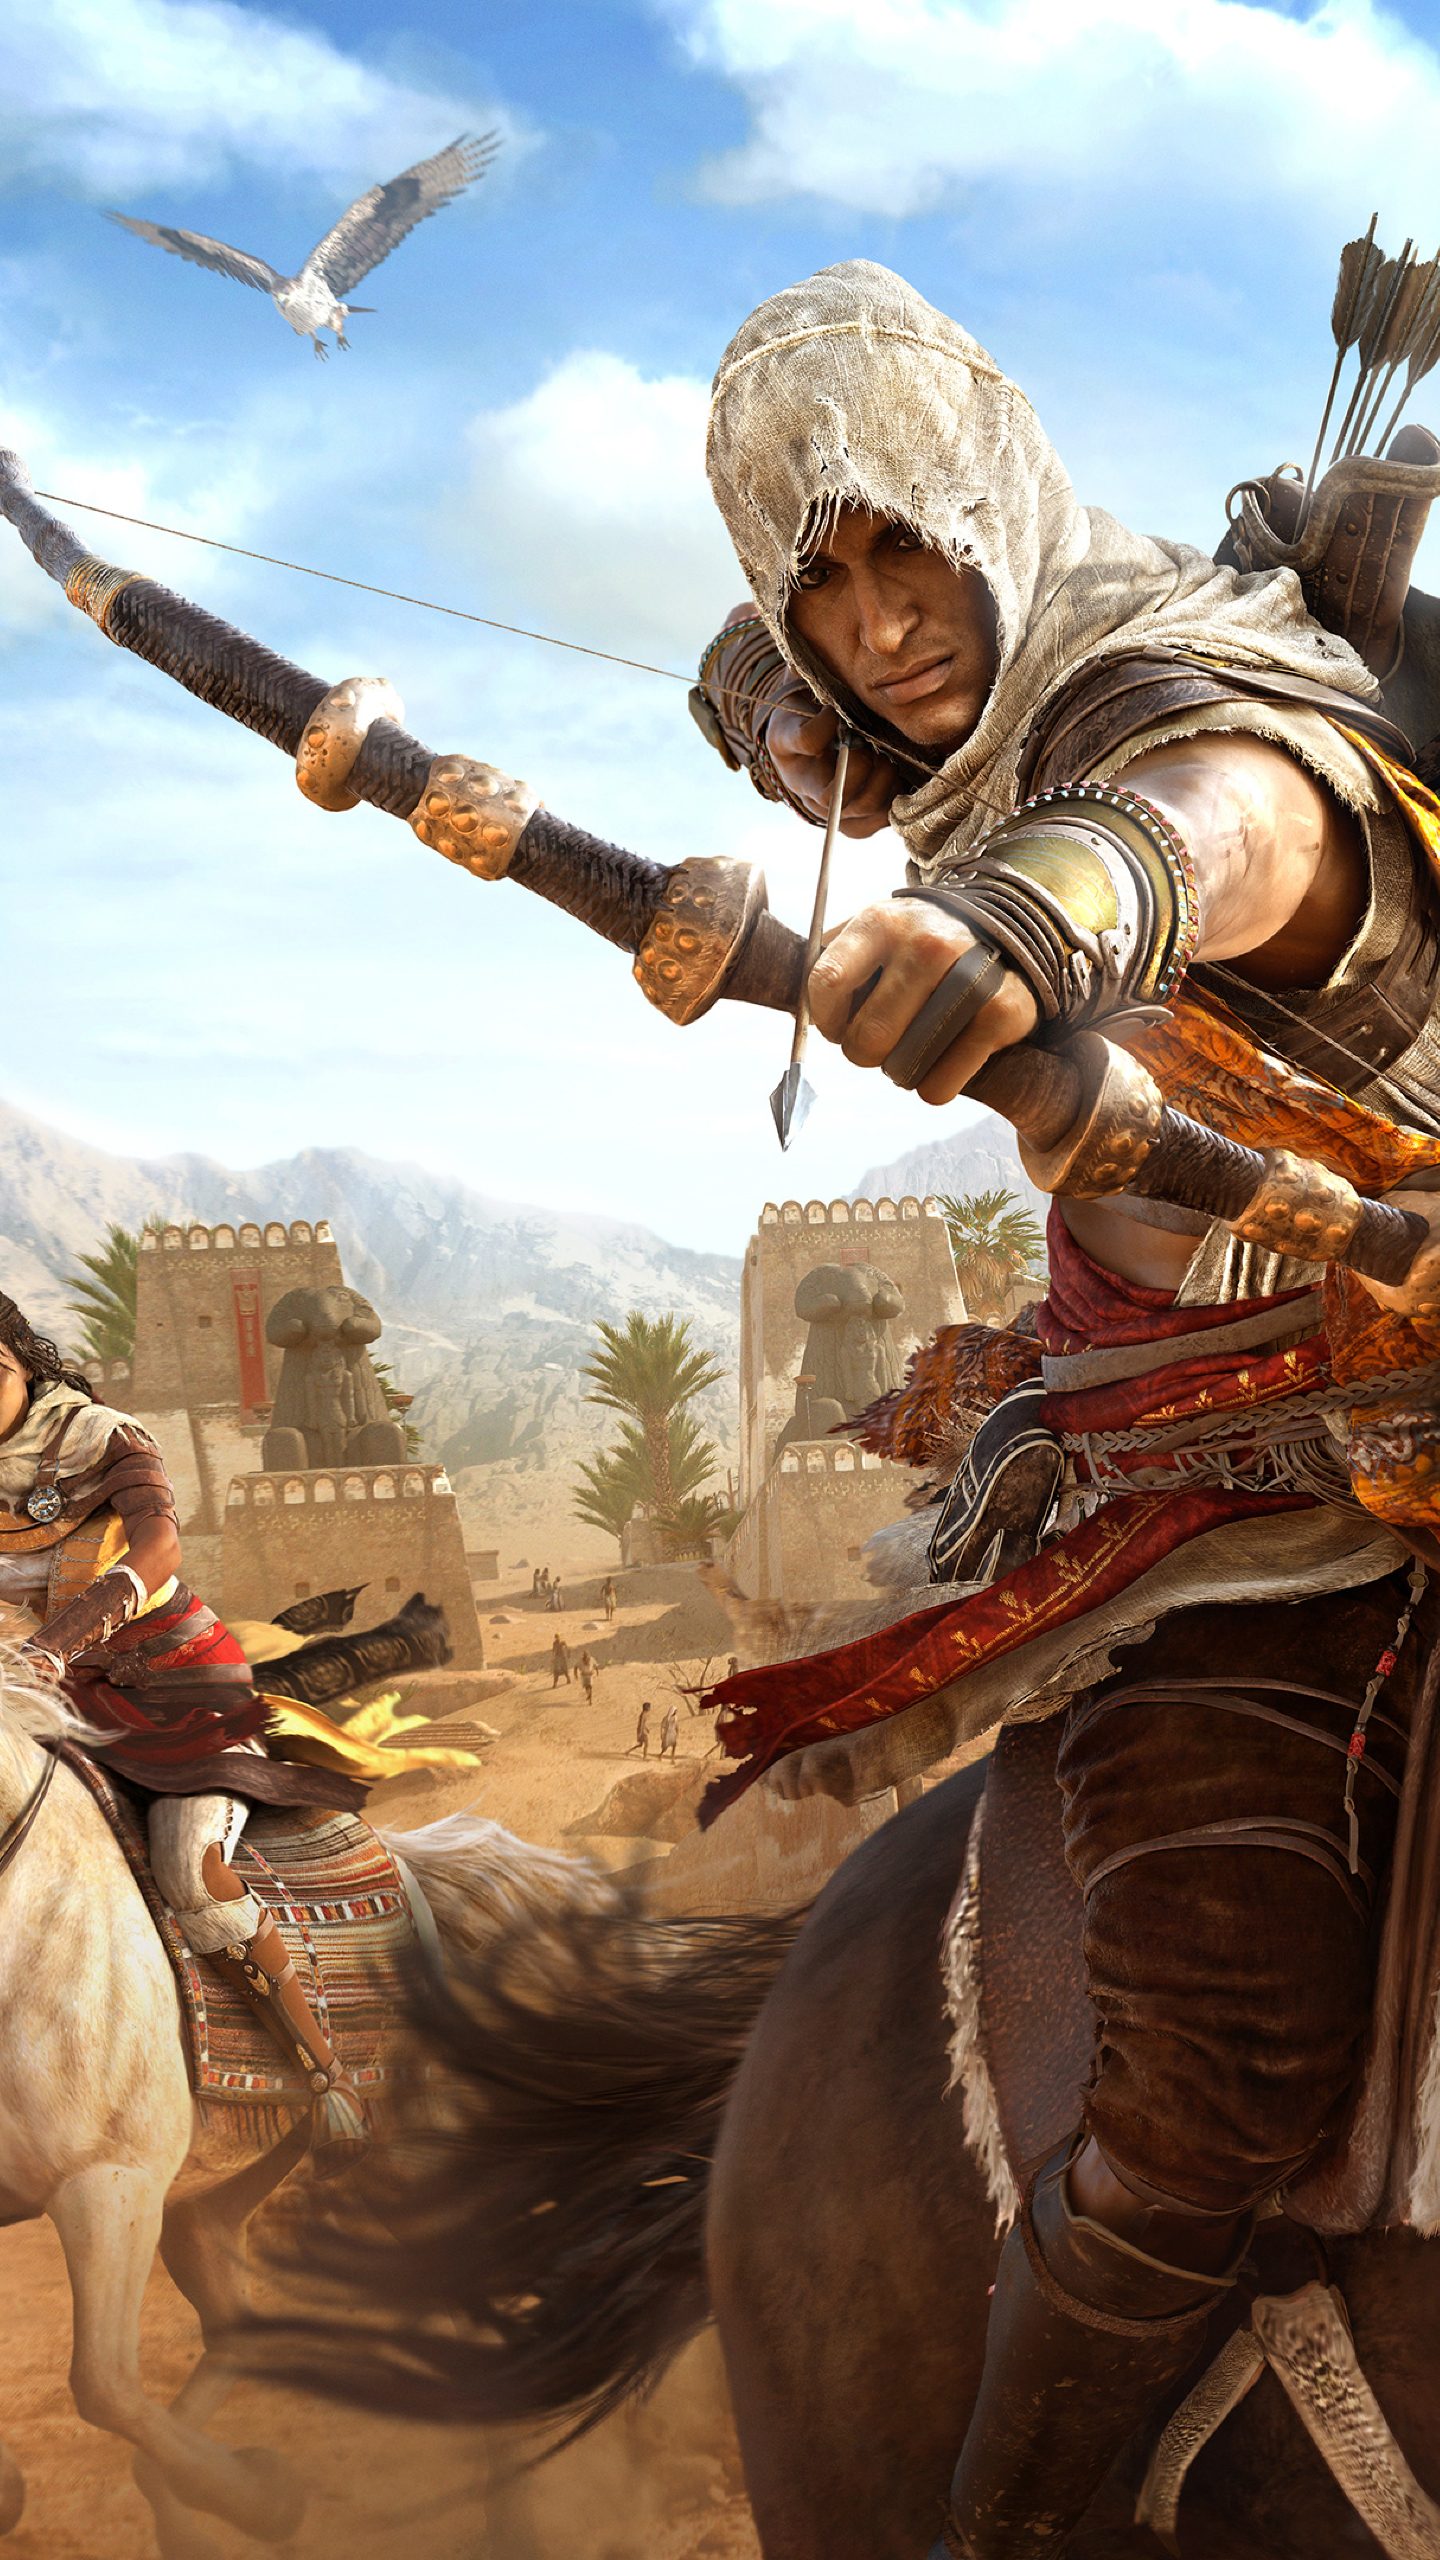 1440x2560 Assassins Creed Origins Bayek And Aya Samsung Galaxy S6 S7